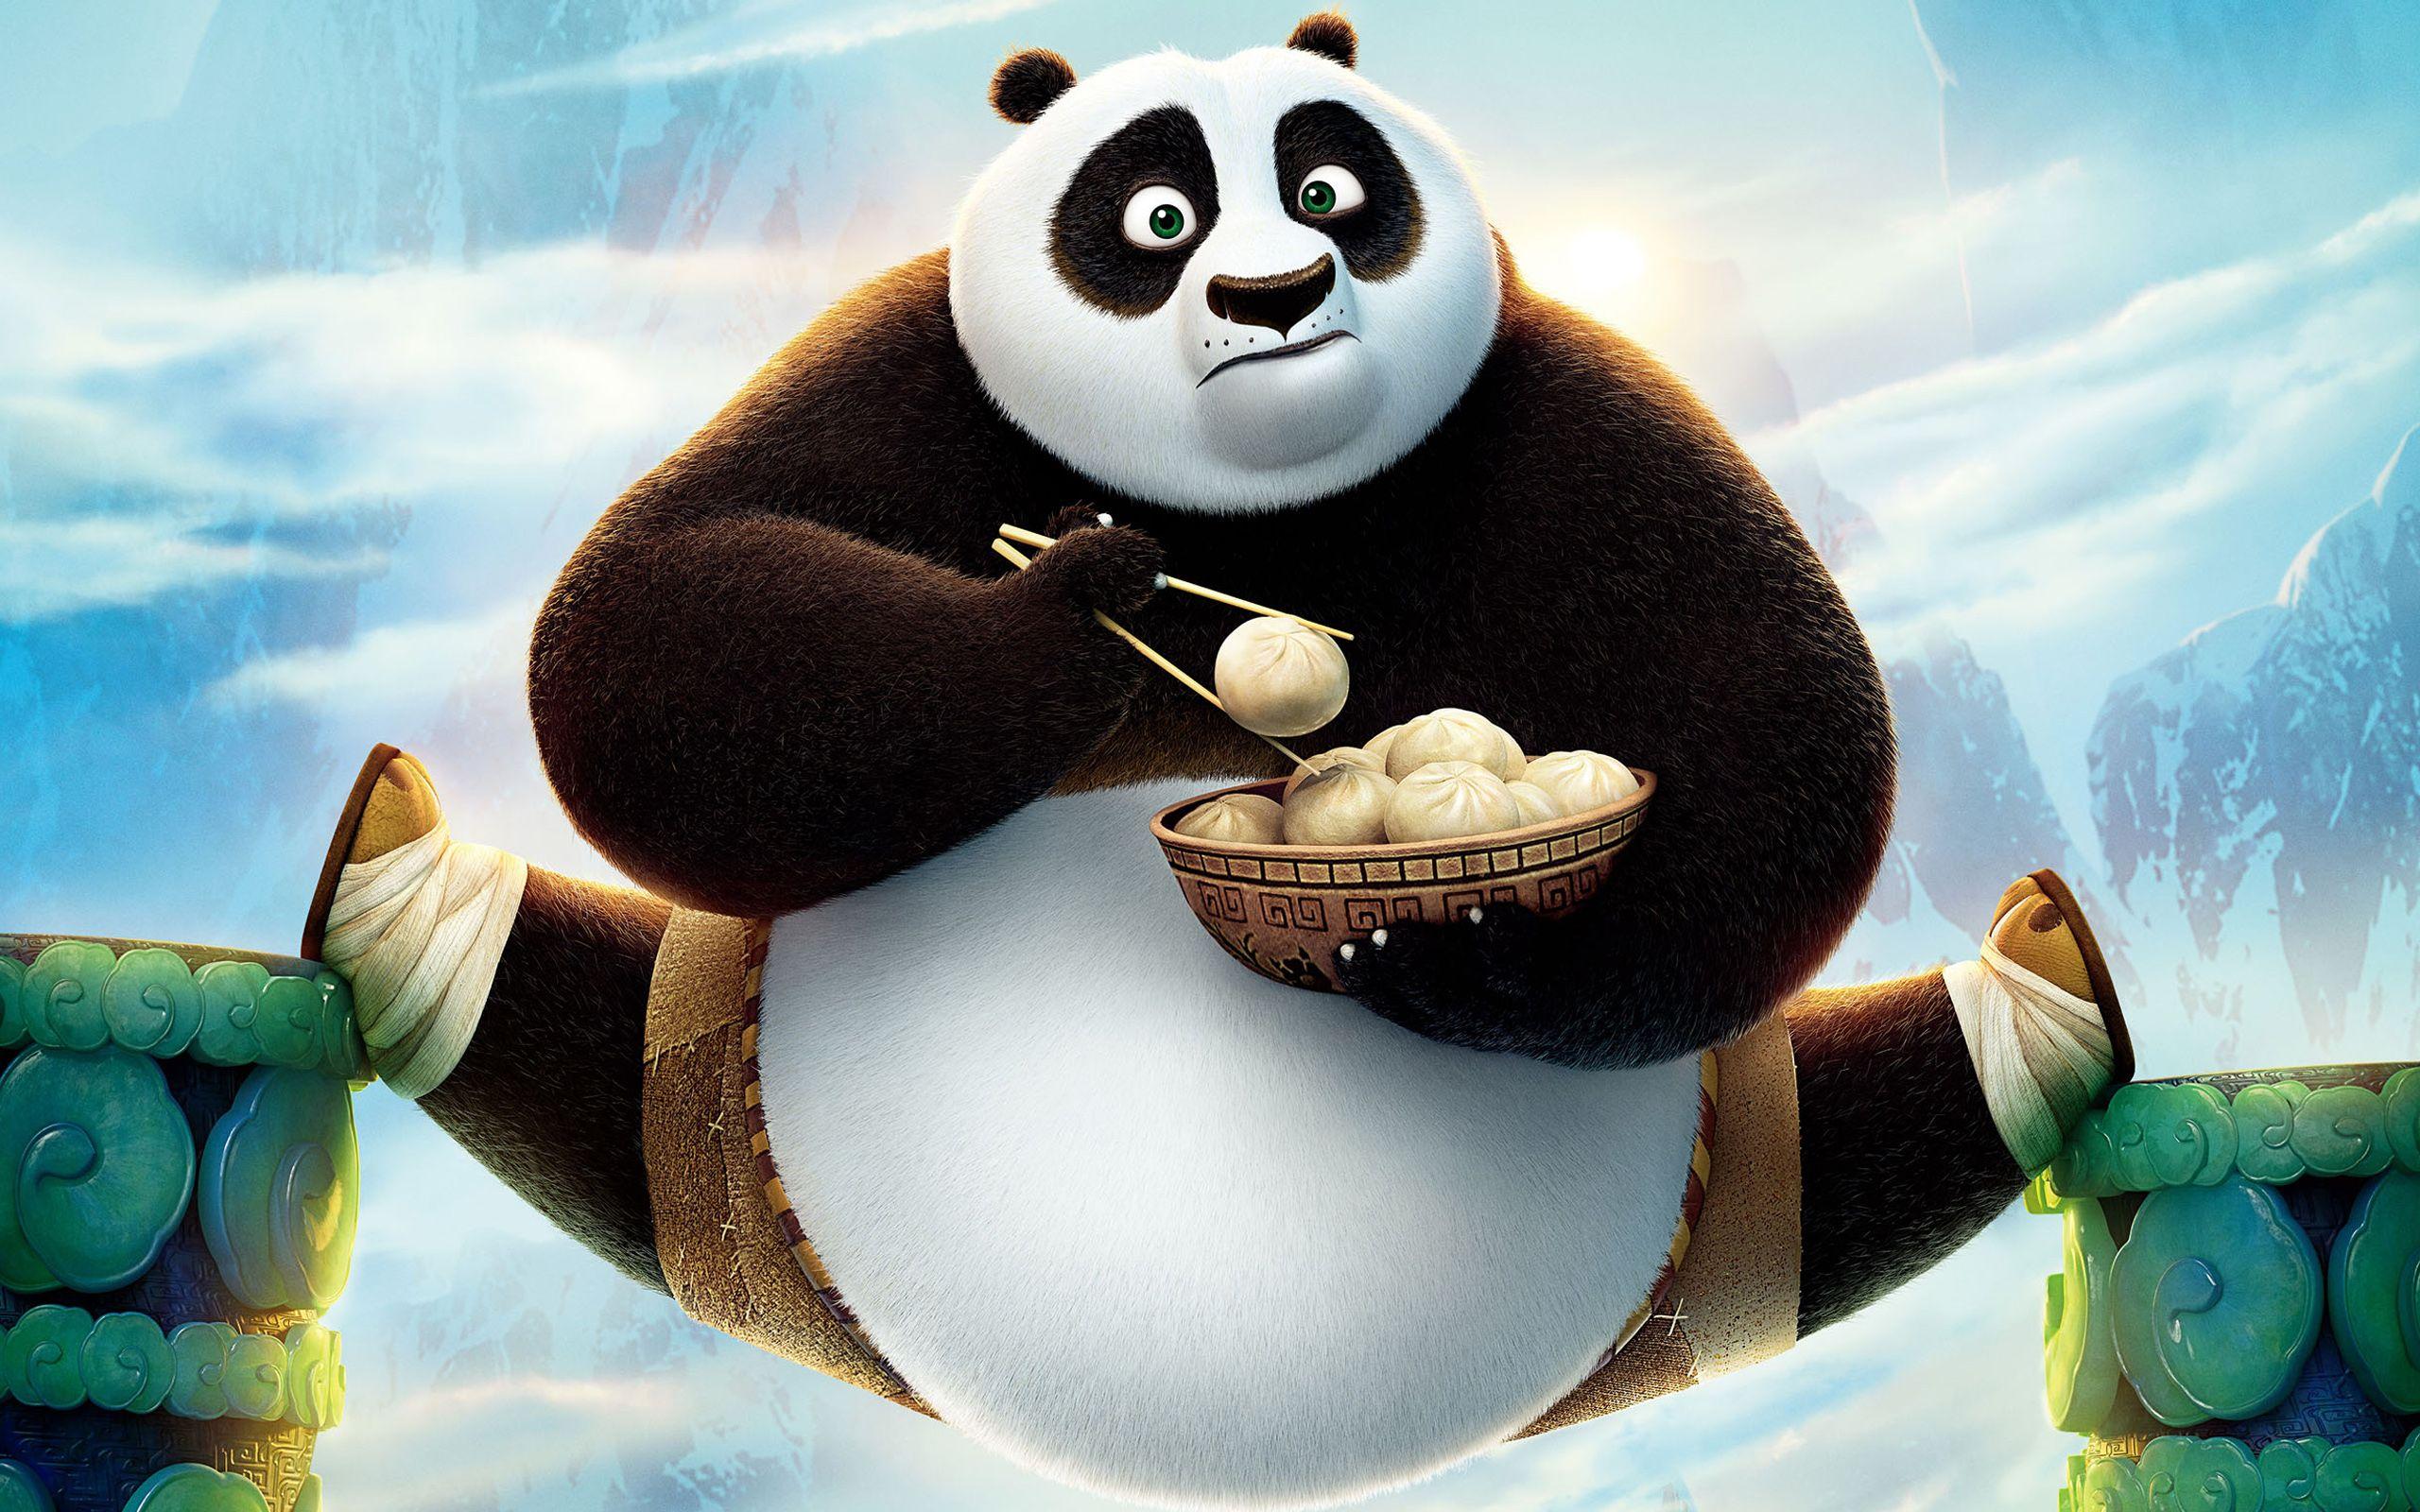 Kung Fu Panda 3 Wallpapers Find best latest Kung Fu Panda 3